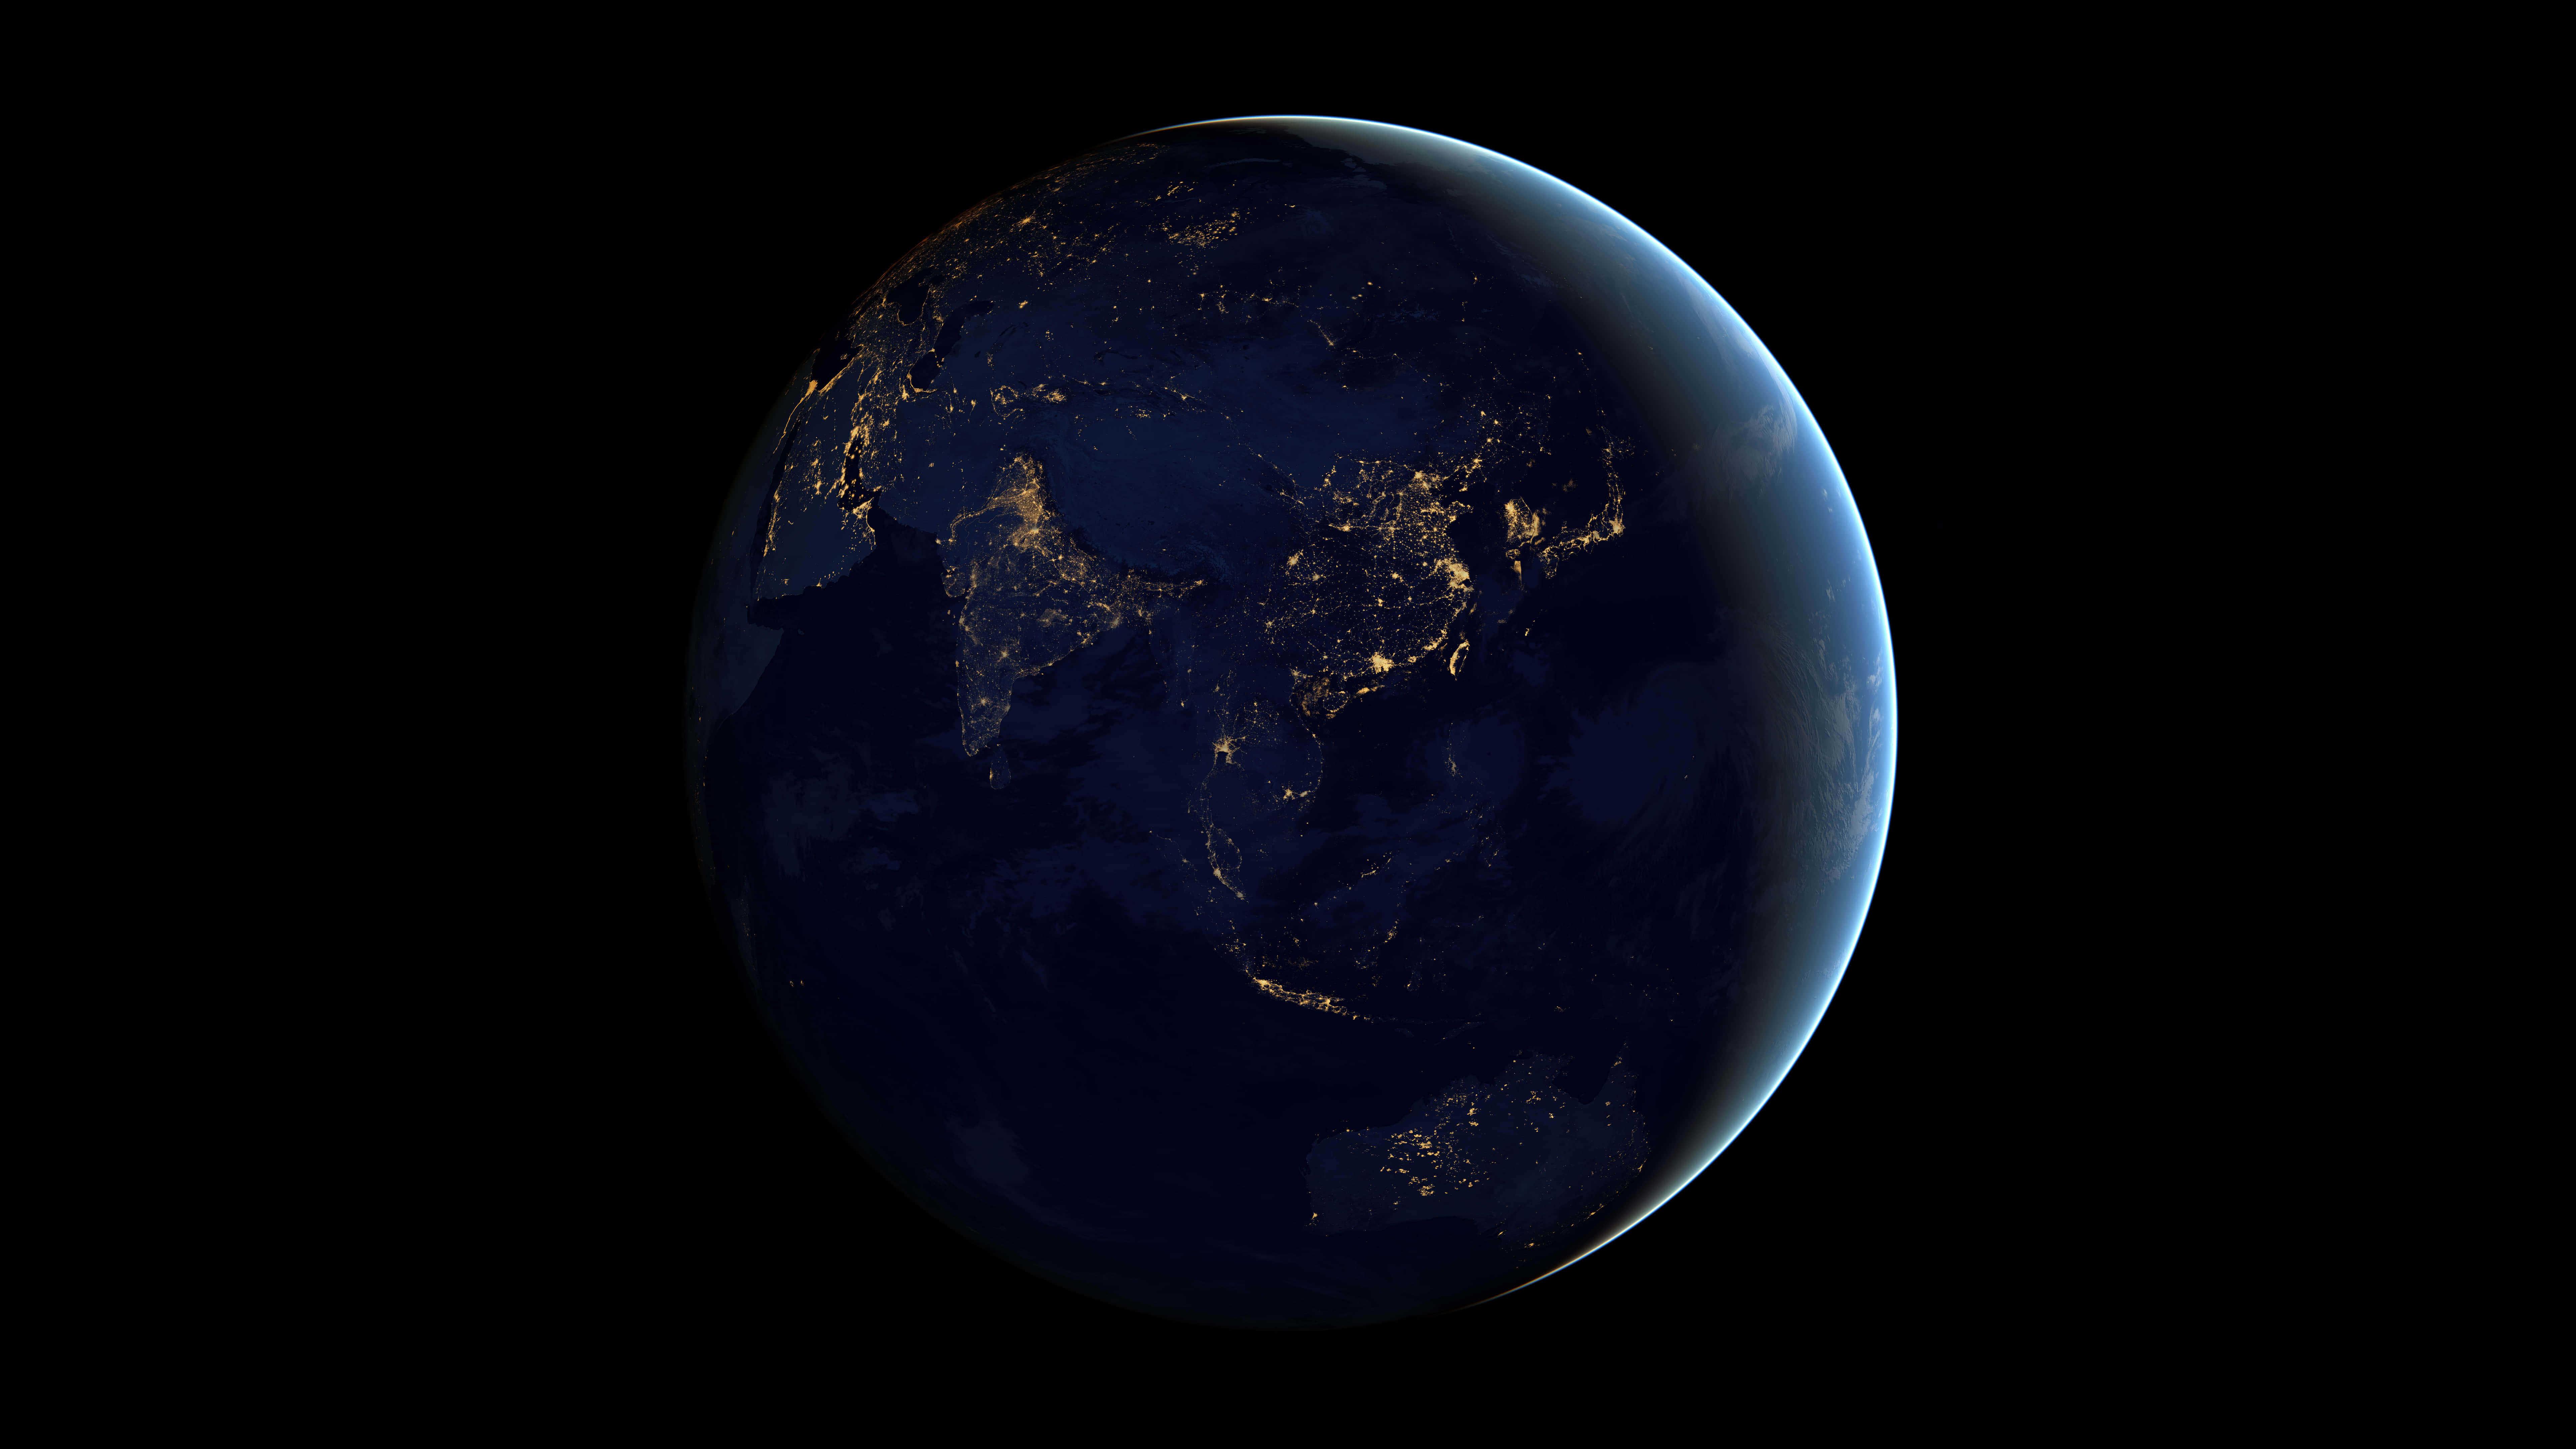 planet earth at night uhd 8k wallpaper